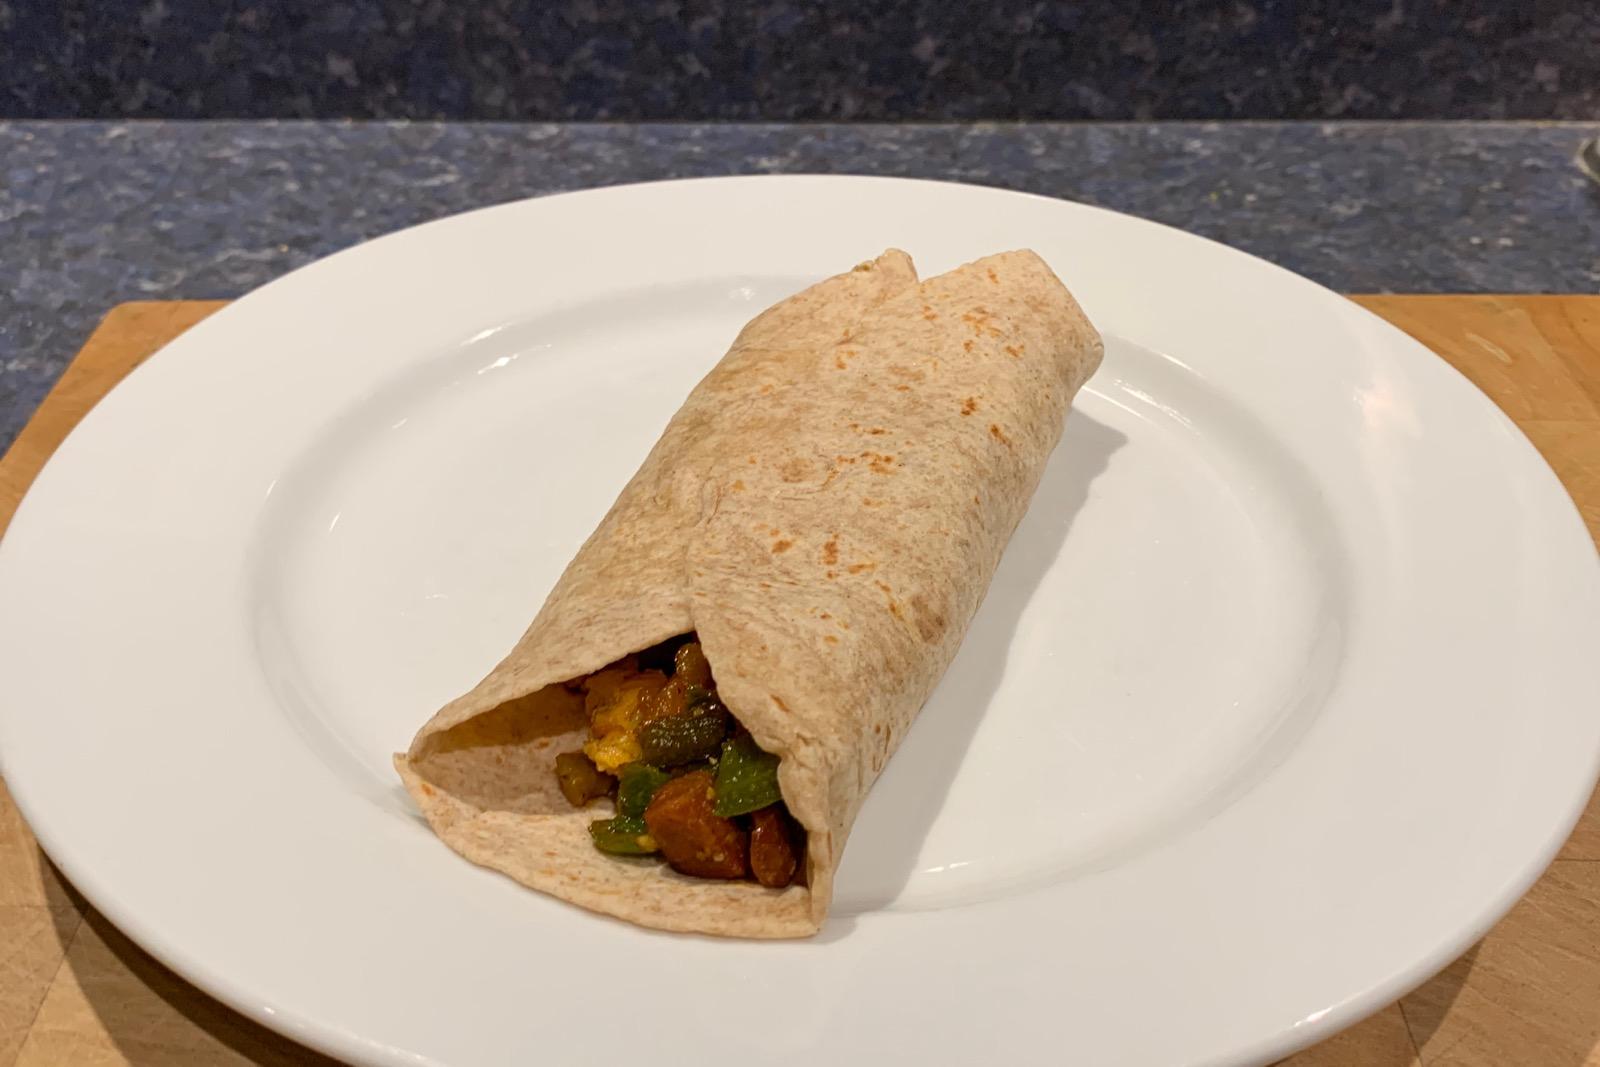 http://blog.rickk.com/food/2020/02/07/ate.2020.02.07.b.jpg